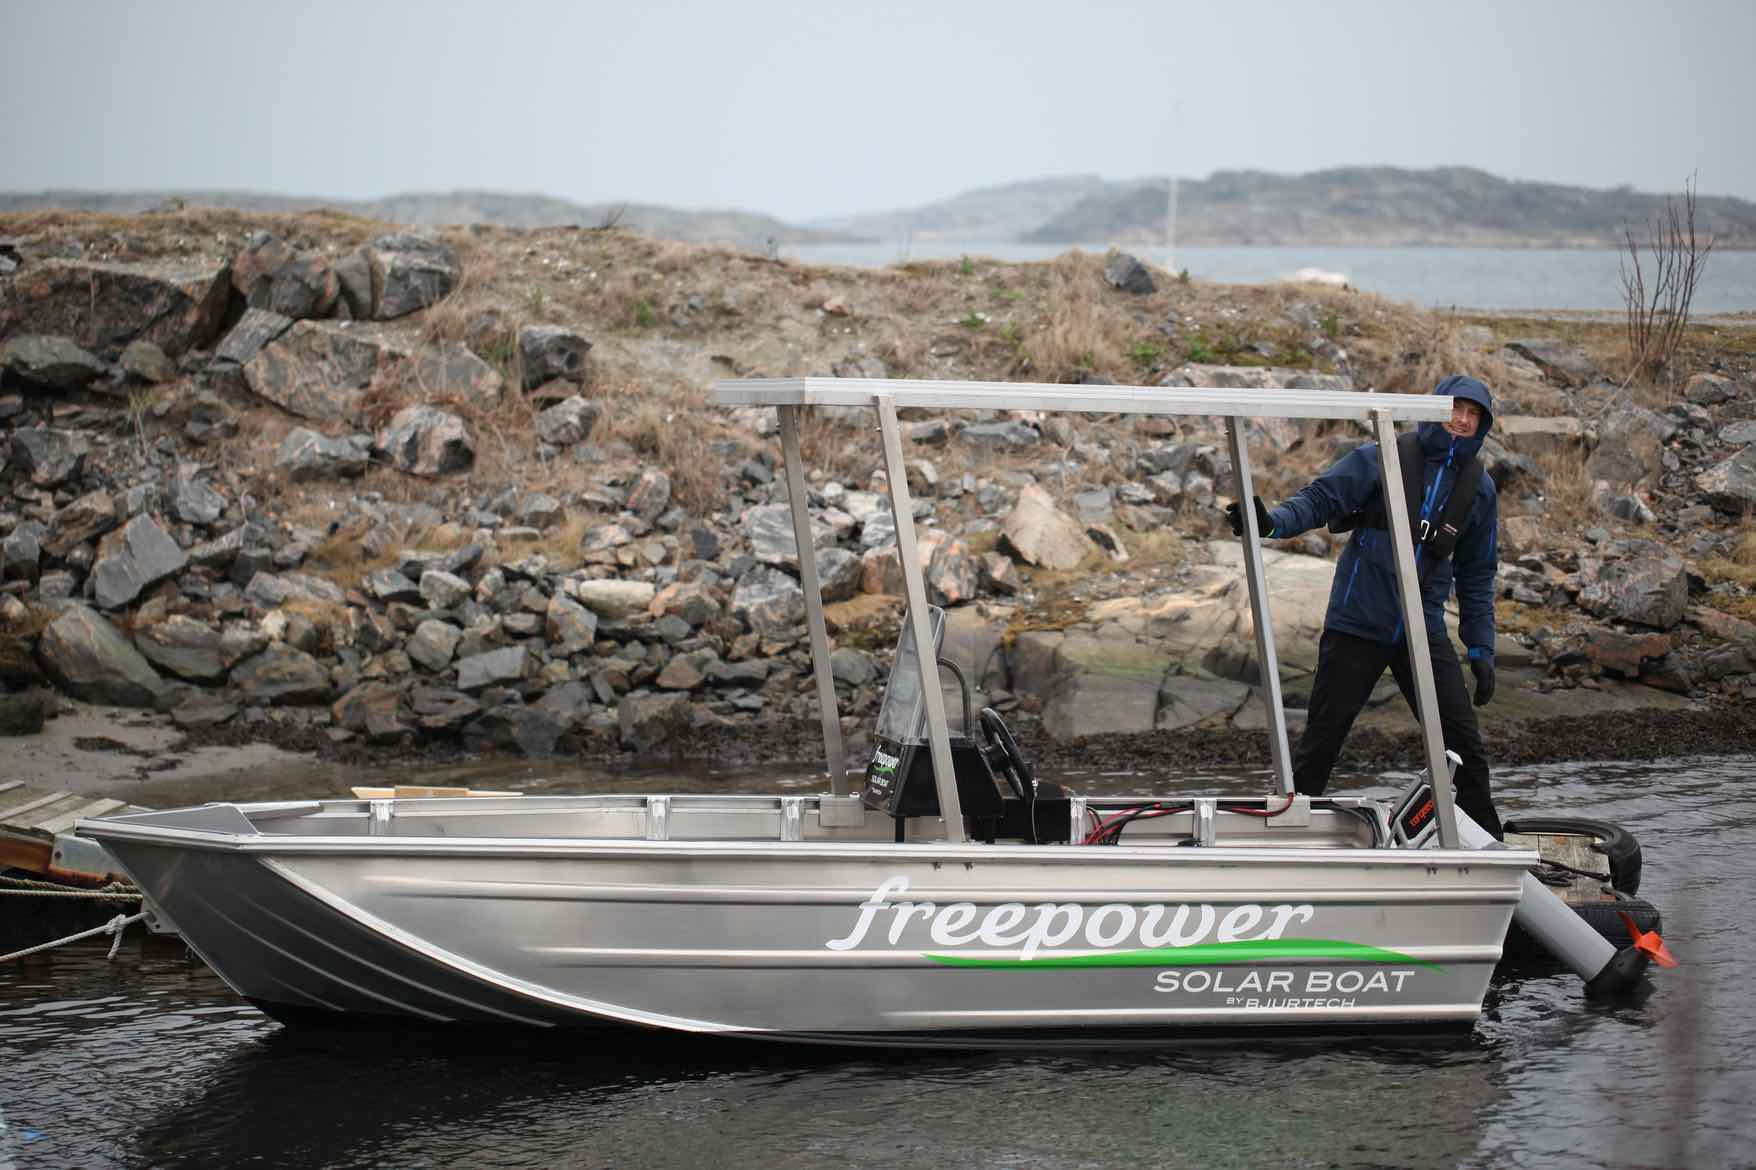 Free power solar boat